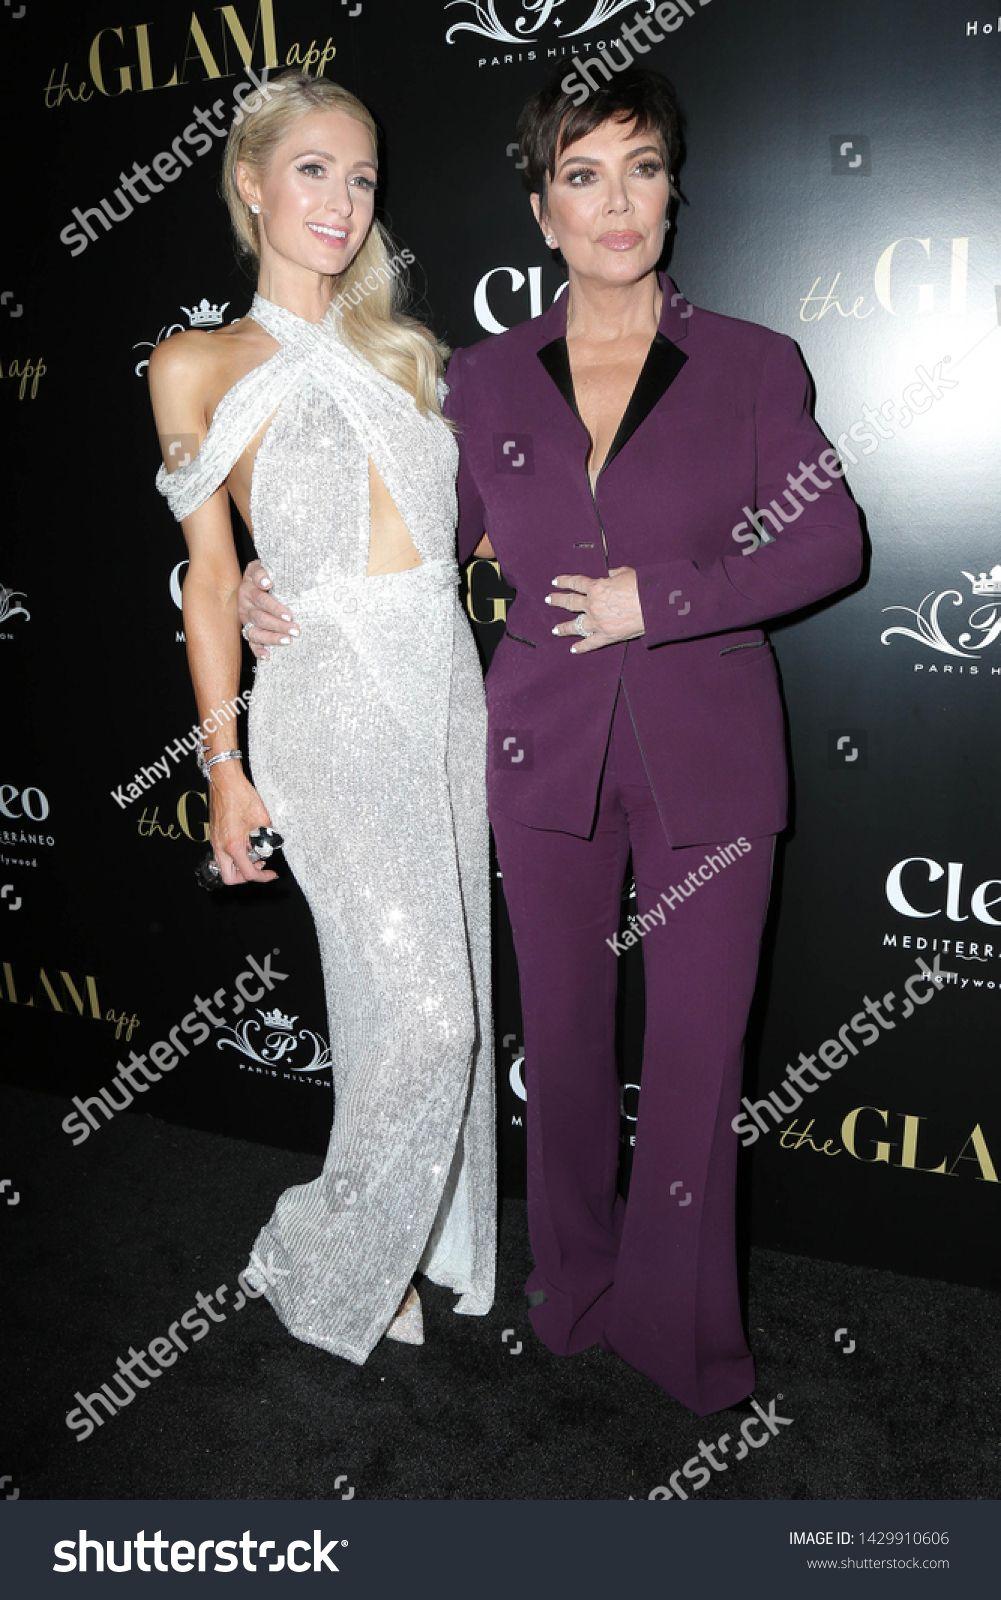 Los Angeles Jun 19 Paris Hilton Kris Jenner At The The Glam App Celebration Event At The Cleo On June 19 2019 I In 2020 Formal Dresses Long Formal Dresses Fashion